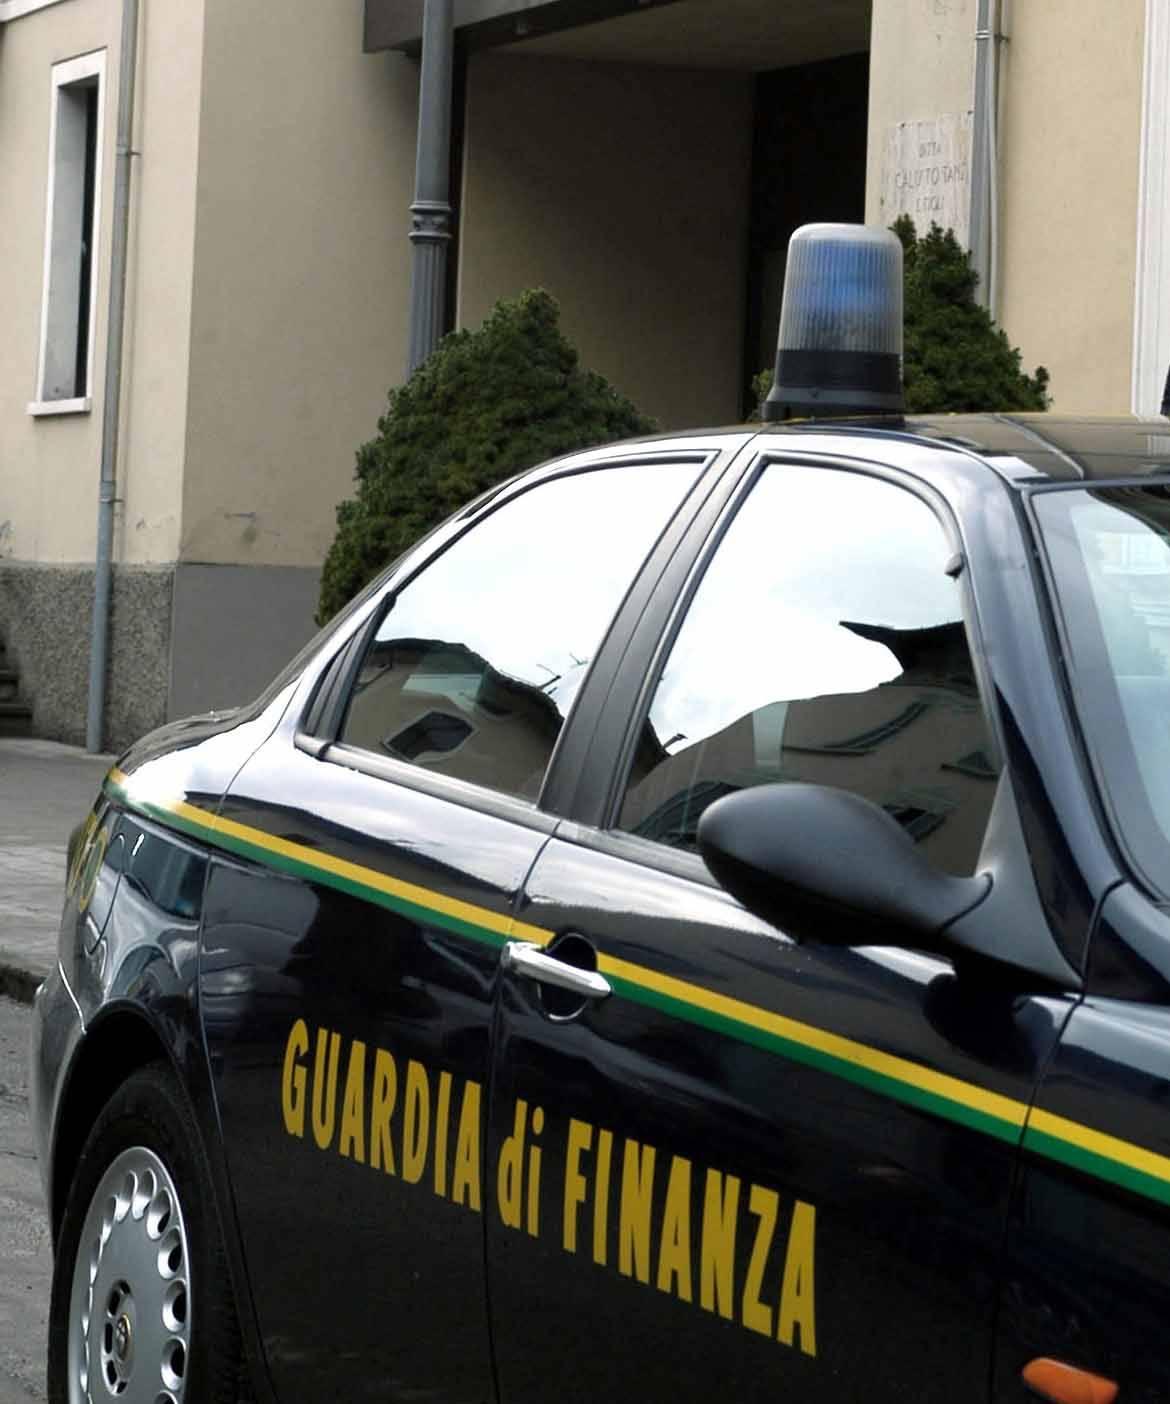 Sequestrati beni per 500mila euro all'ex abate di Montecassino